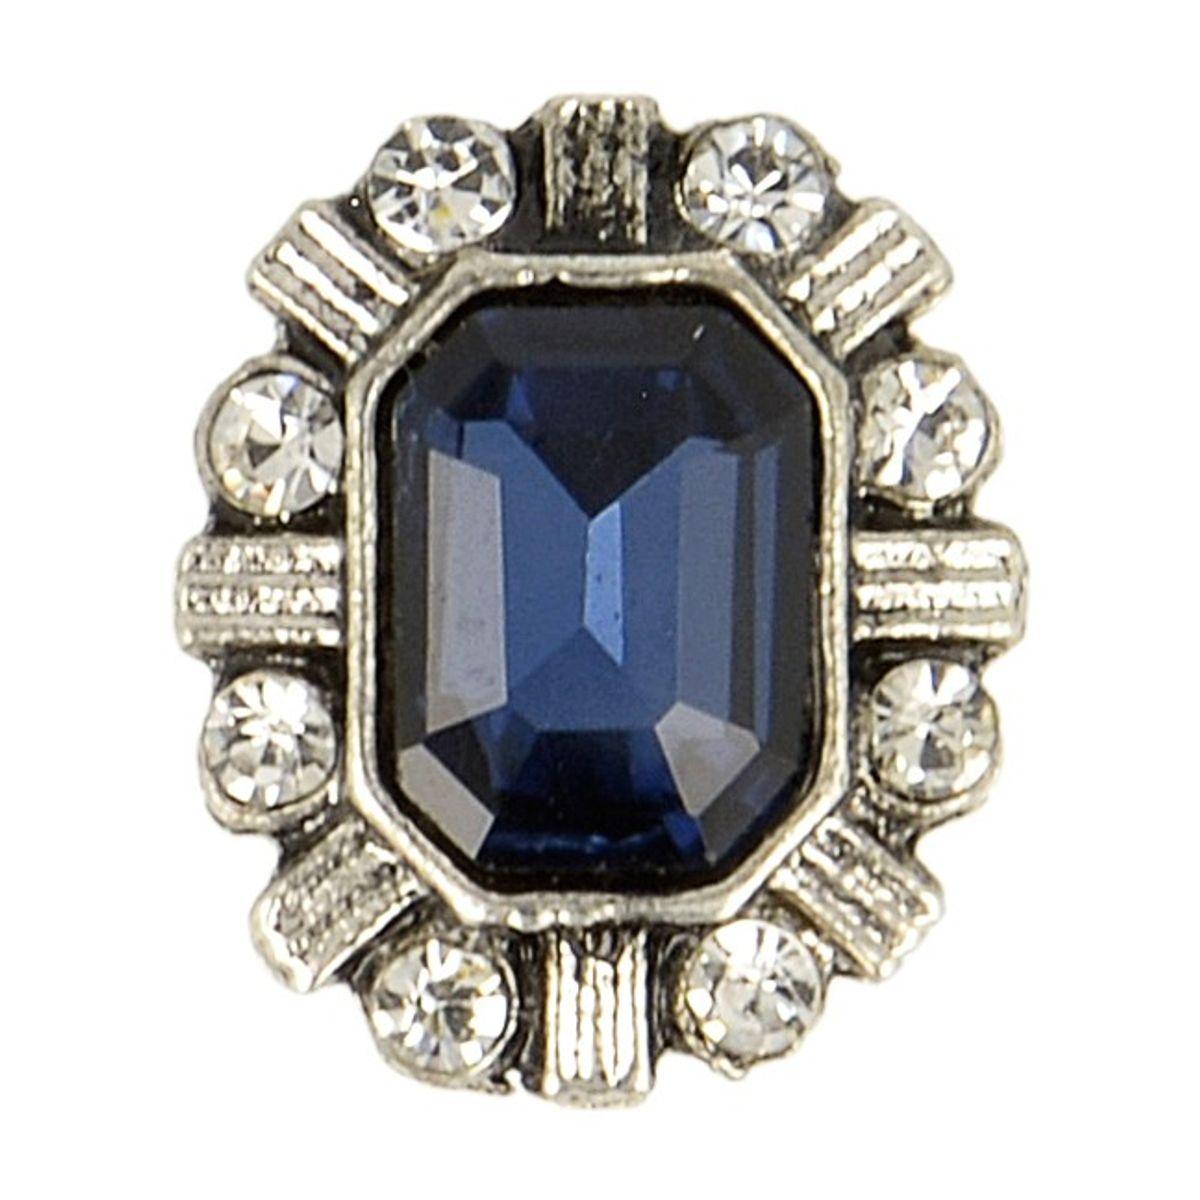 Bouton métal bijoux strass - Bleu marine